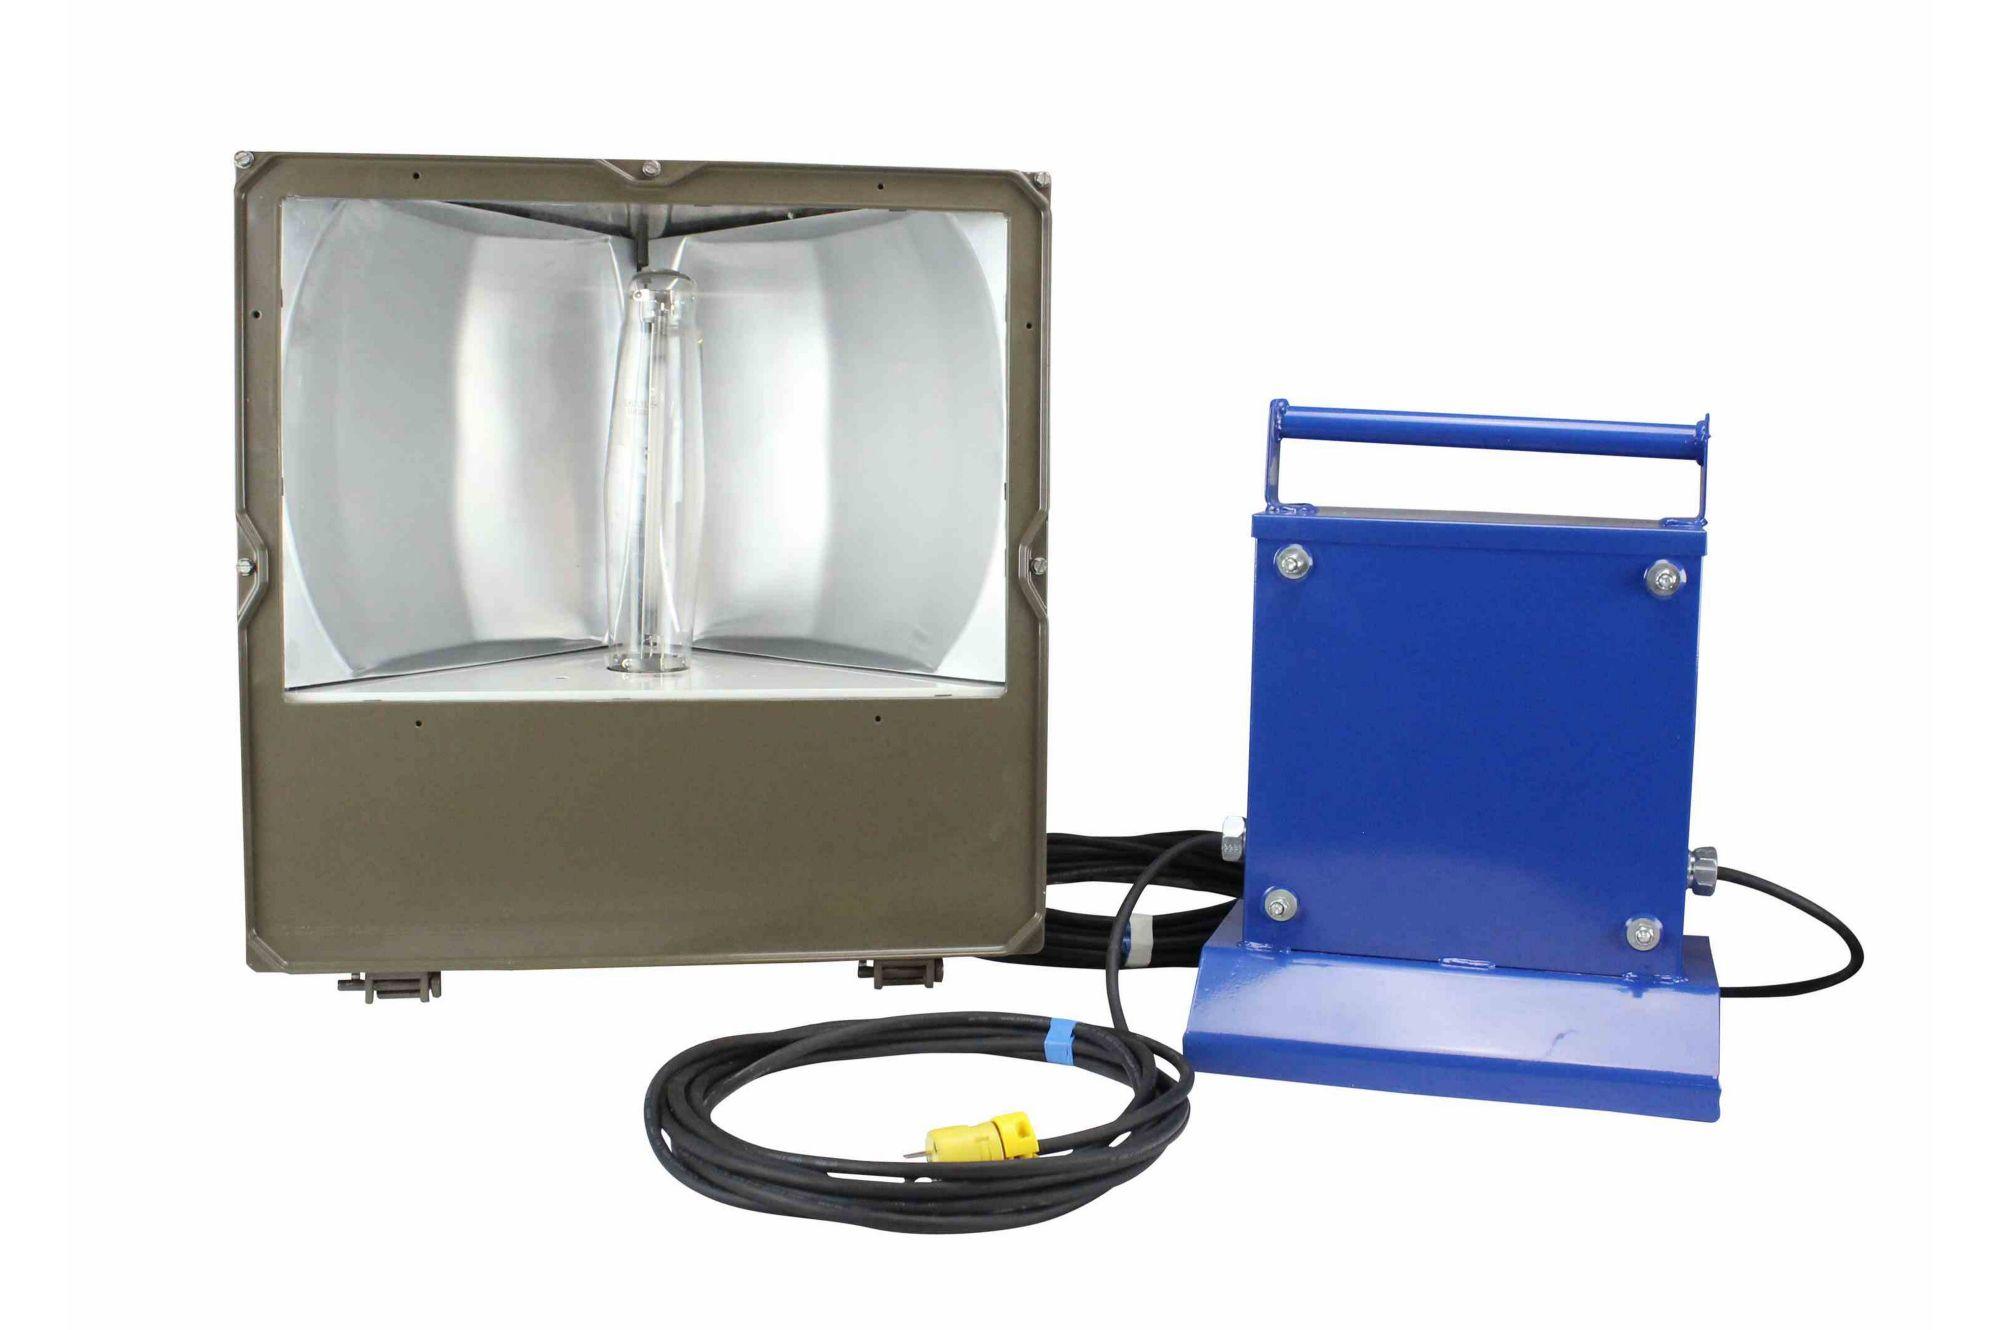 hight resolution of hi res image 2 1000 watt metal halide light with external ballast front